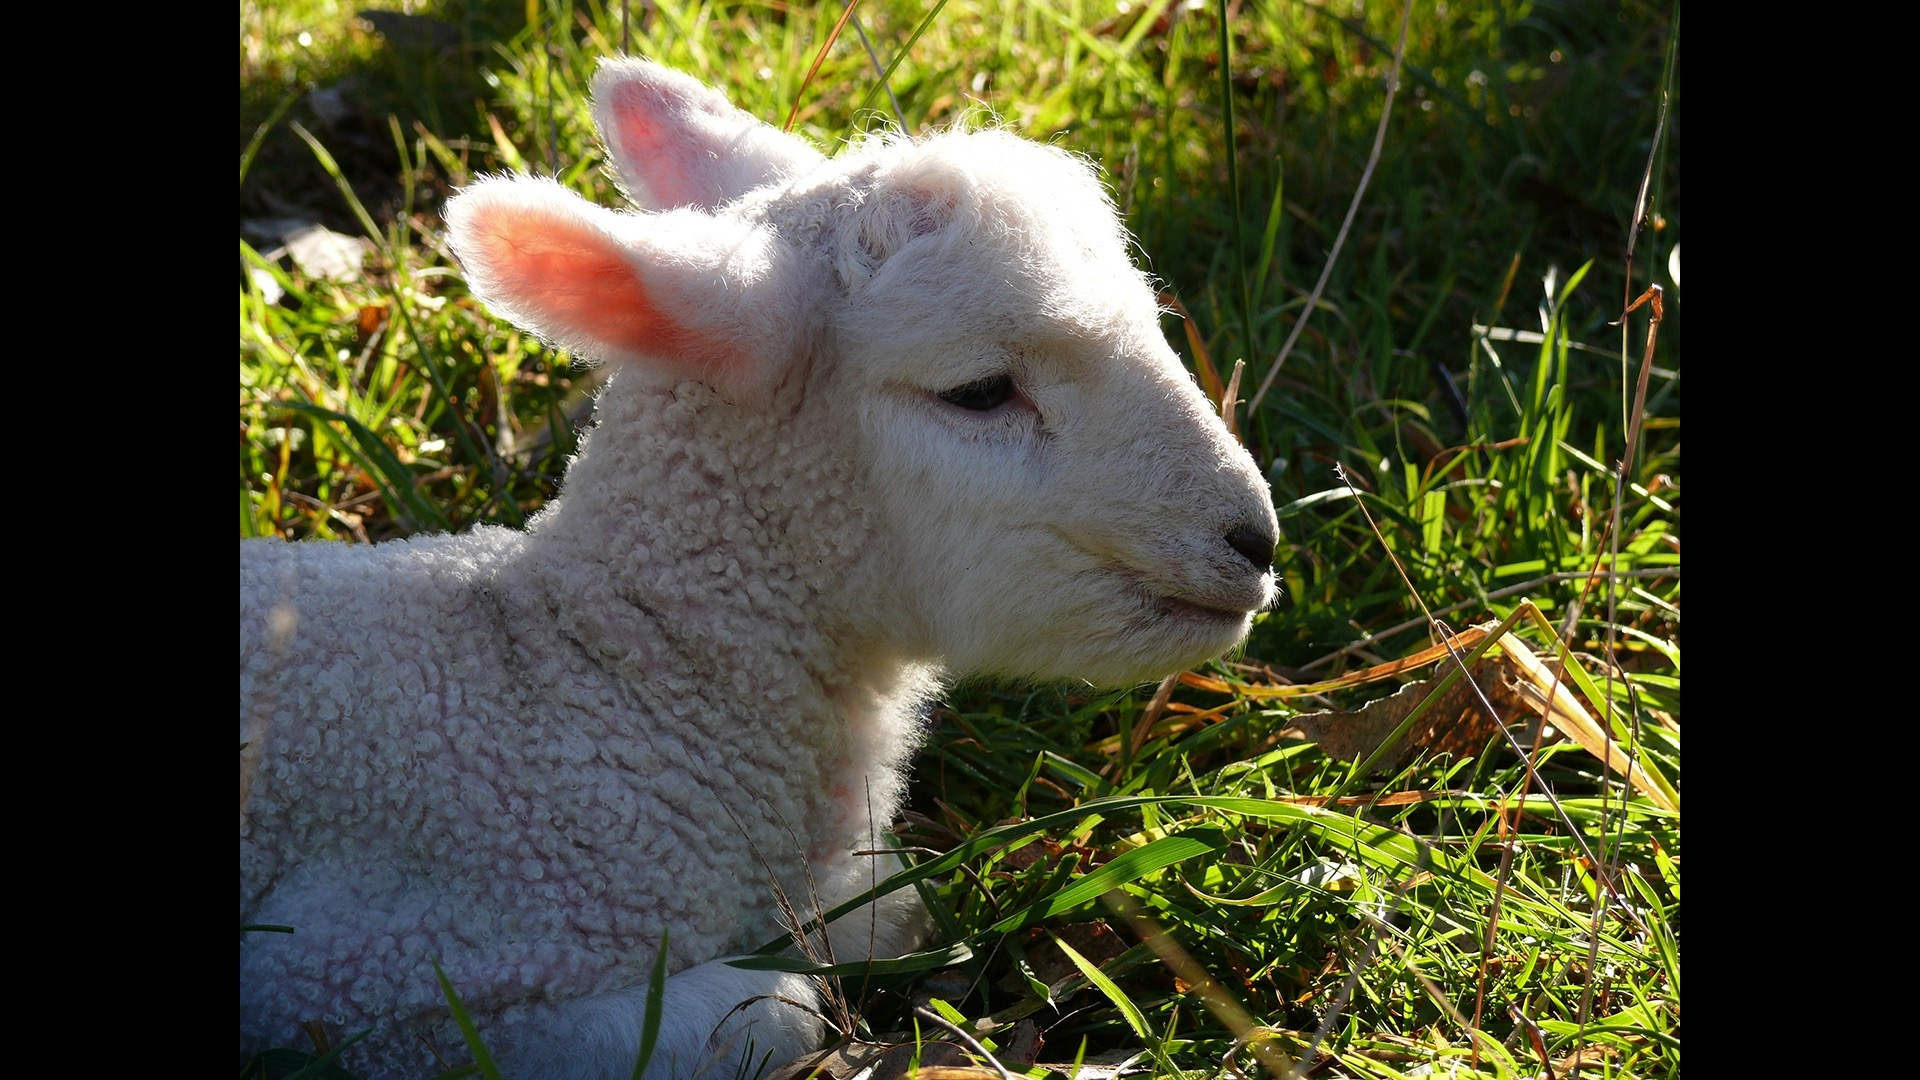 lamb lying down